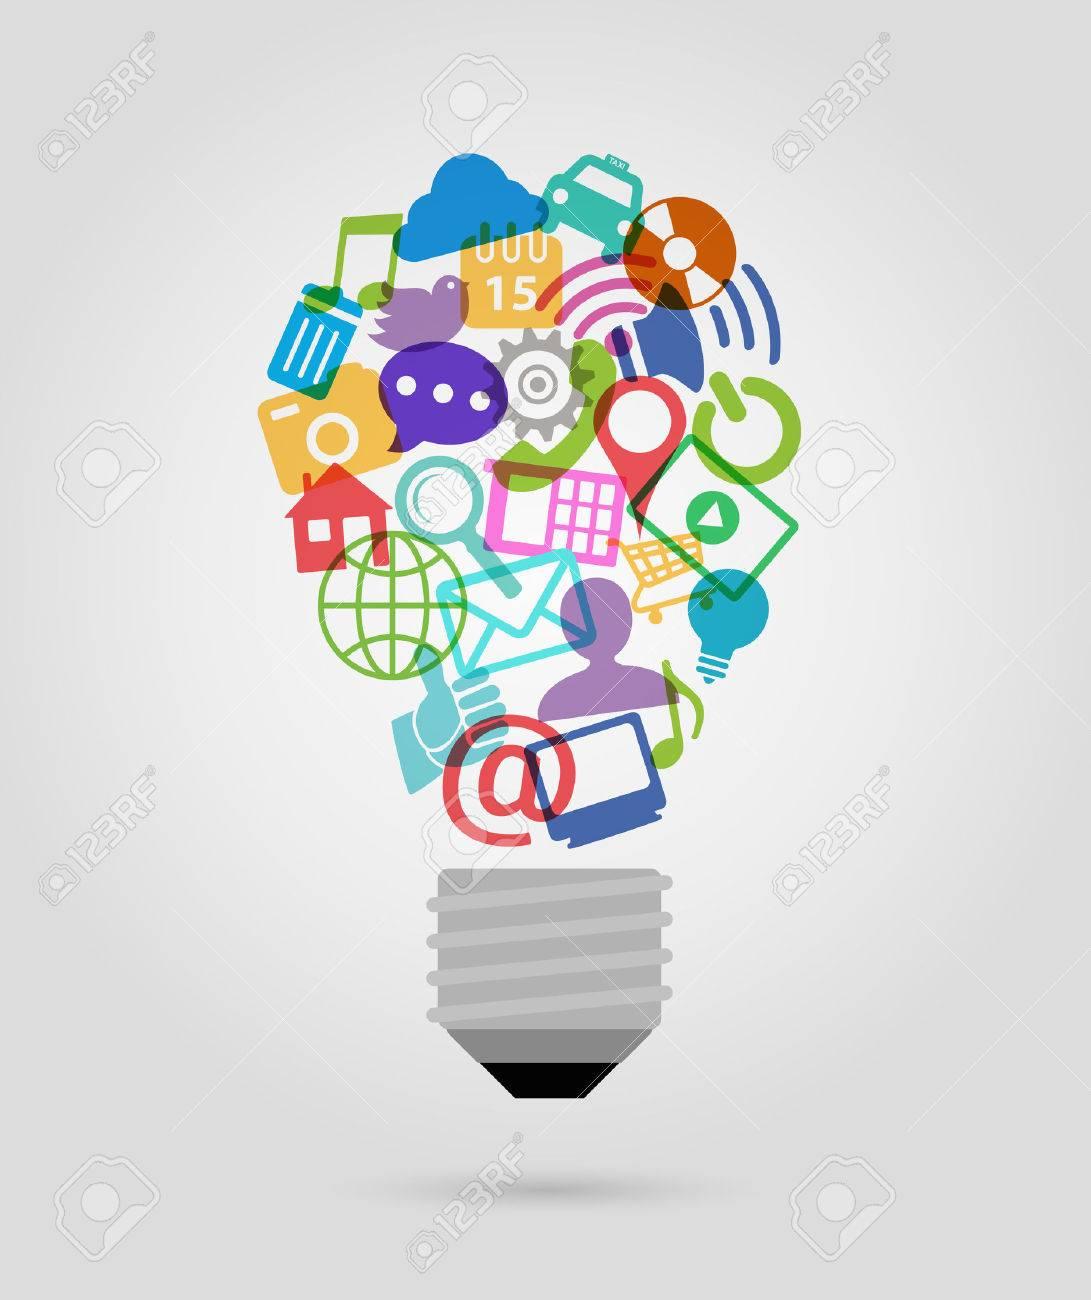 color social media icons, bulb shape - 43273059